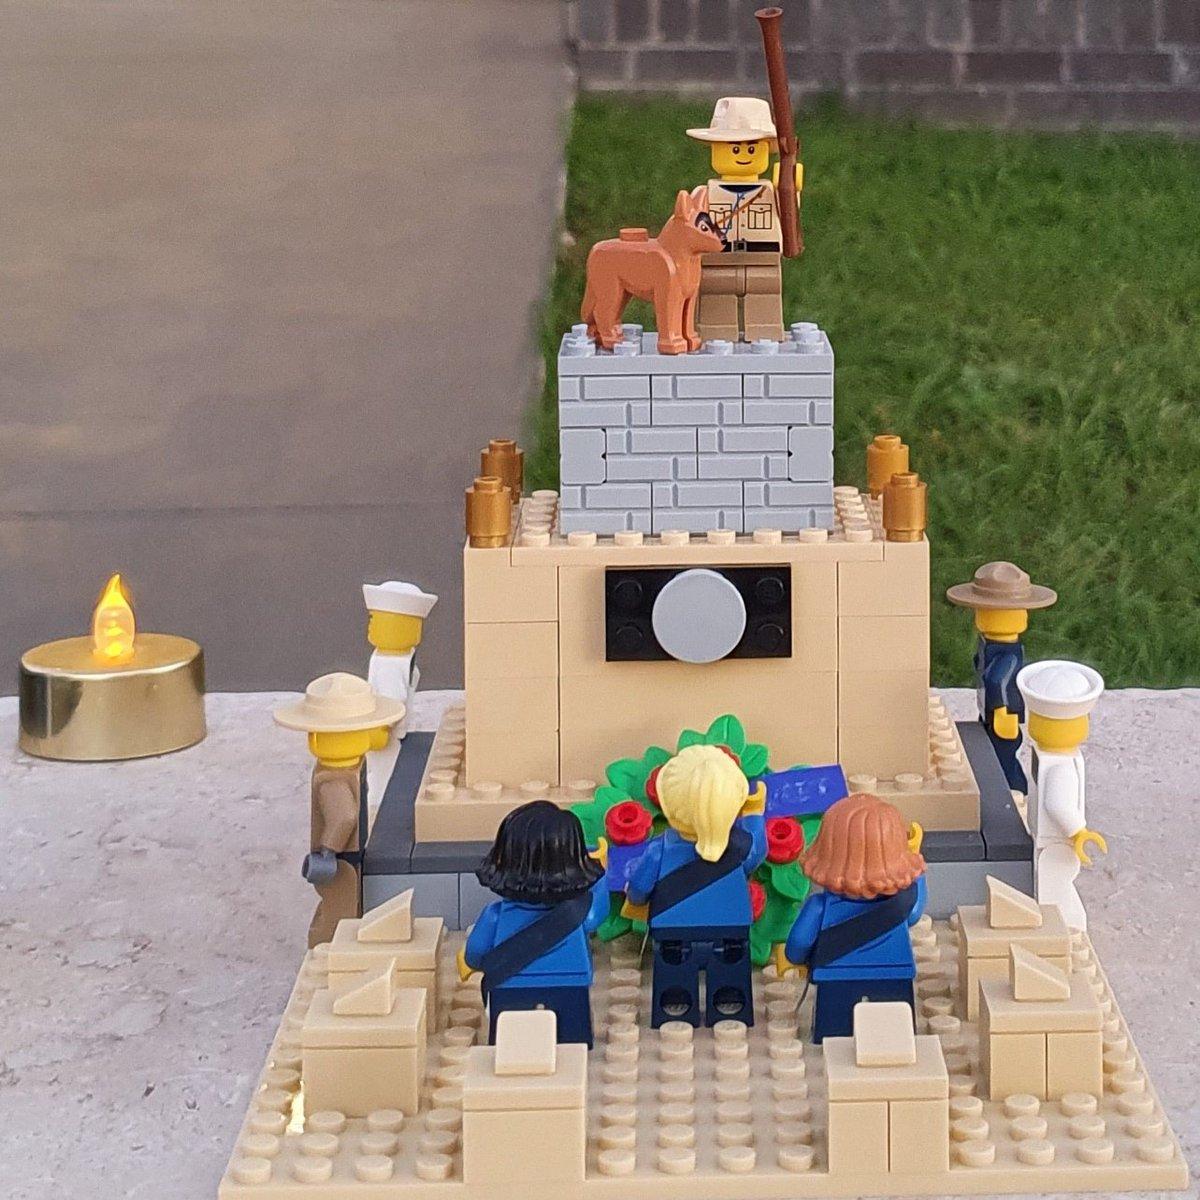 #anzacday2020 My own ANZAC Day memorial @girlguidesaust #GirlGuides #Lego https://t.co/SlNUUBIg7C